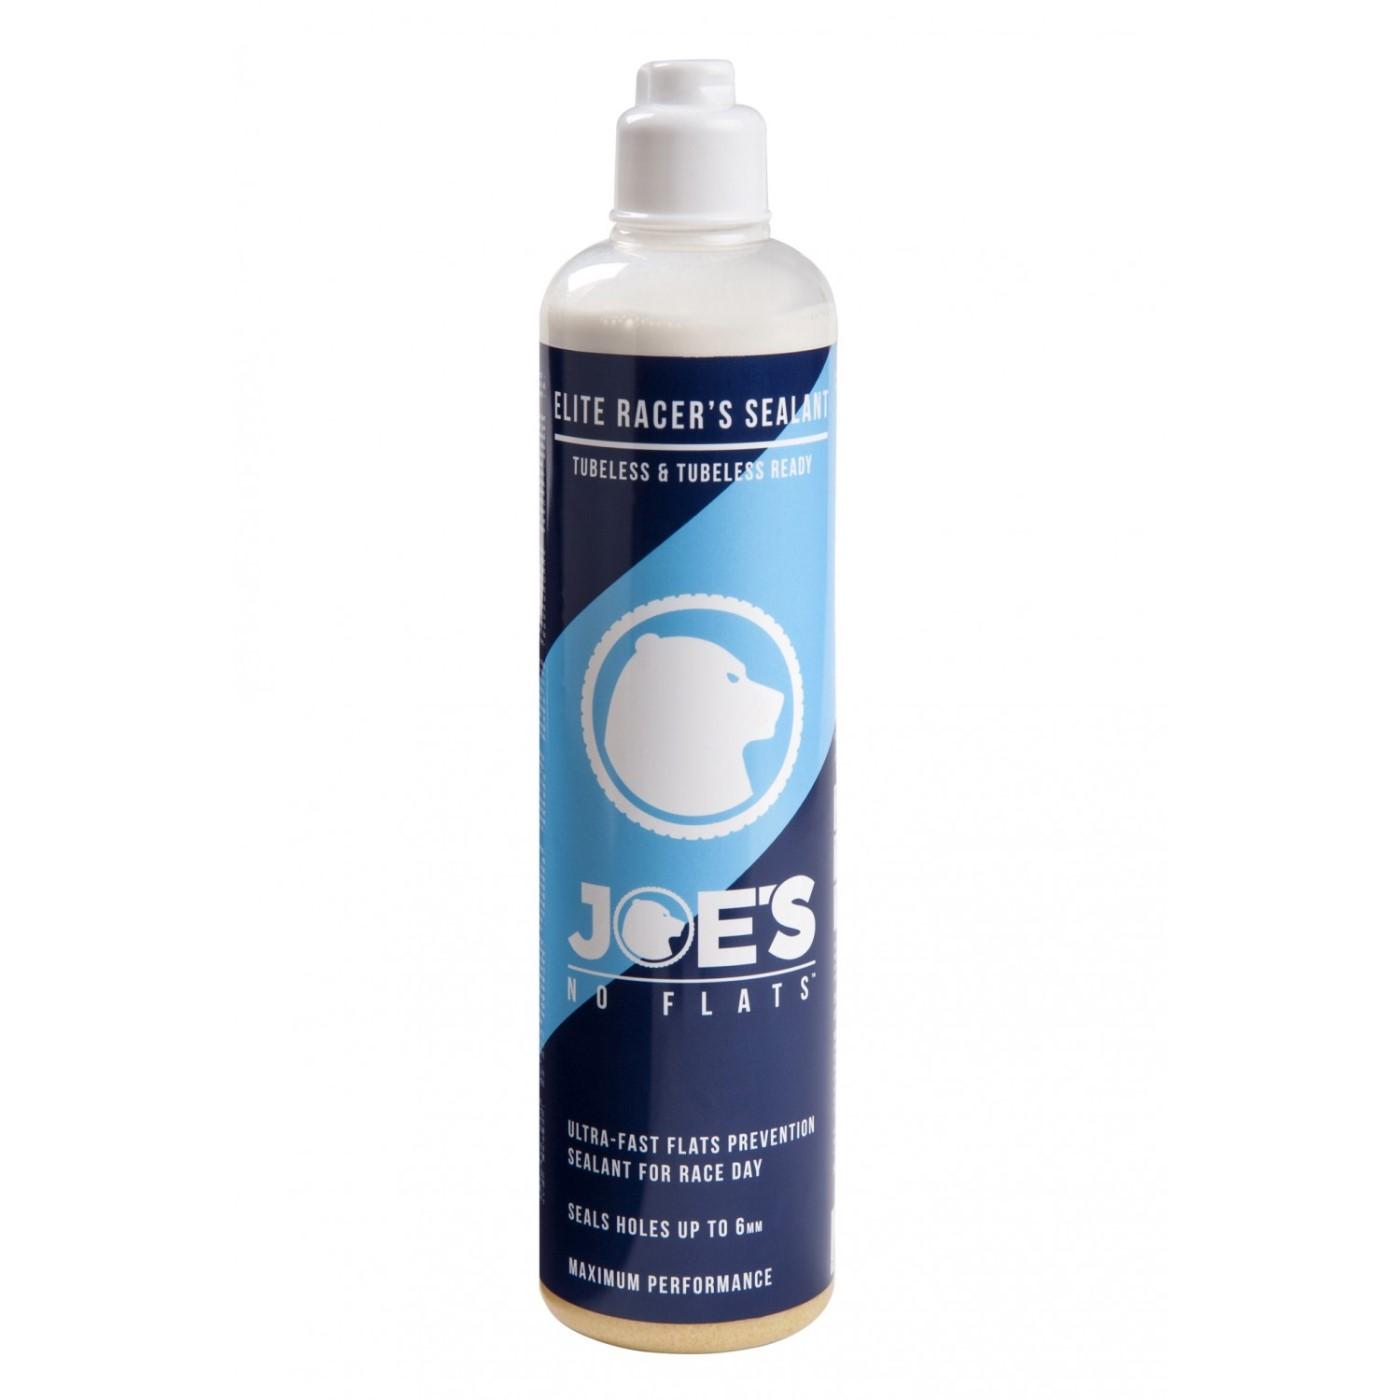 Tmel JOE´S No Flats Elite Racers Sealant 500 ml